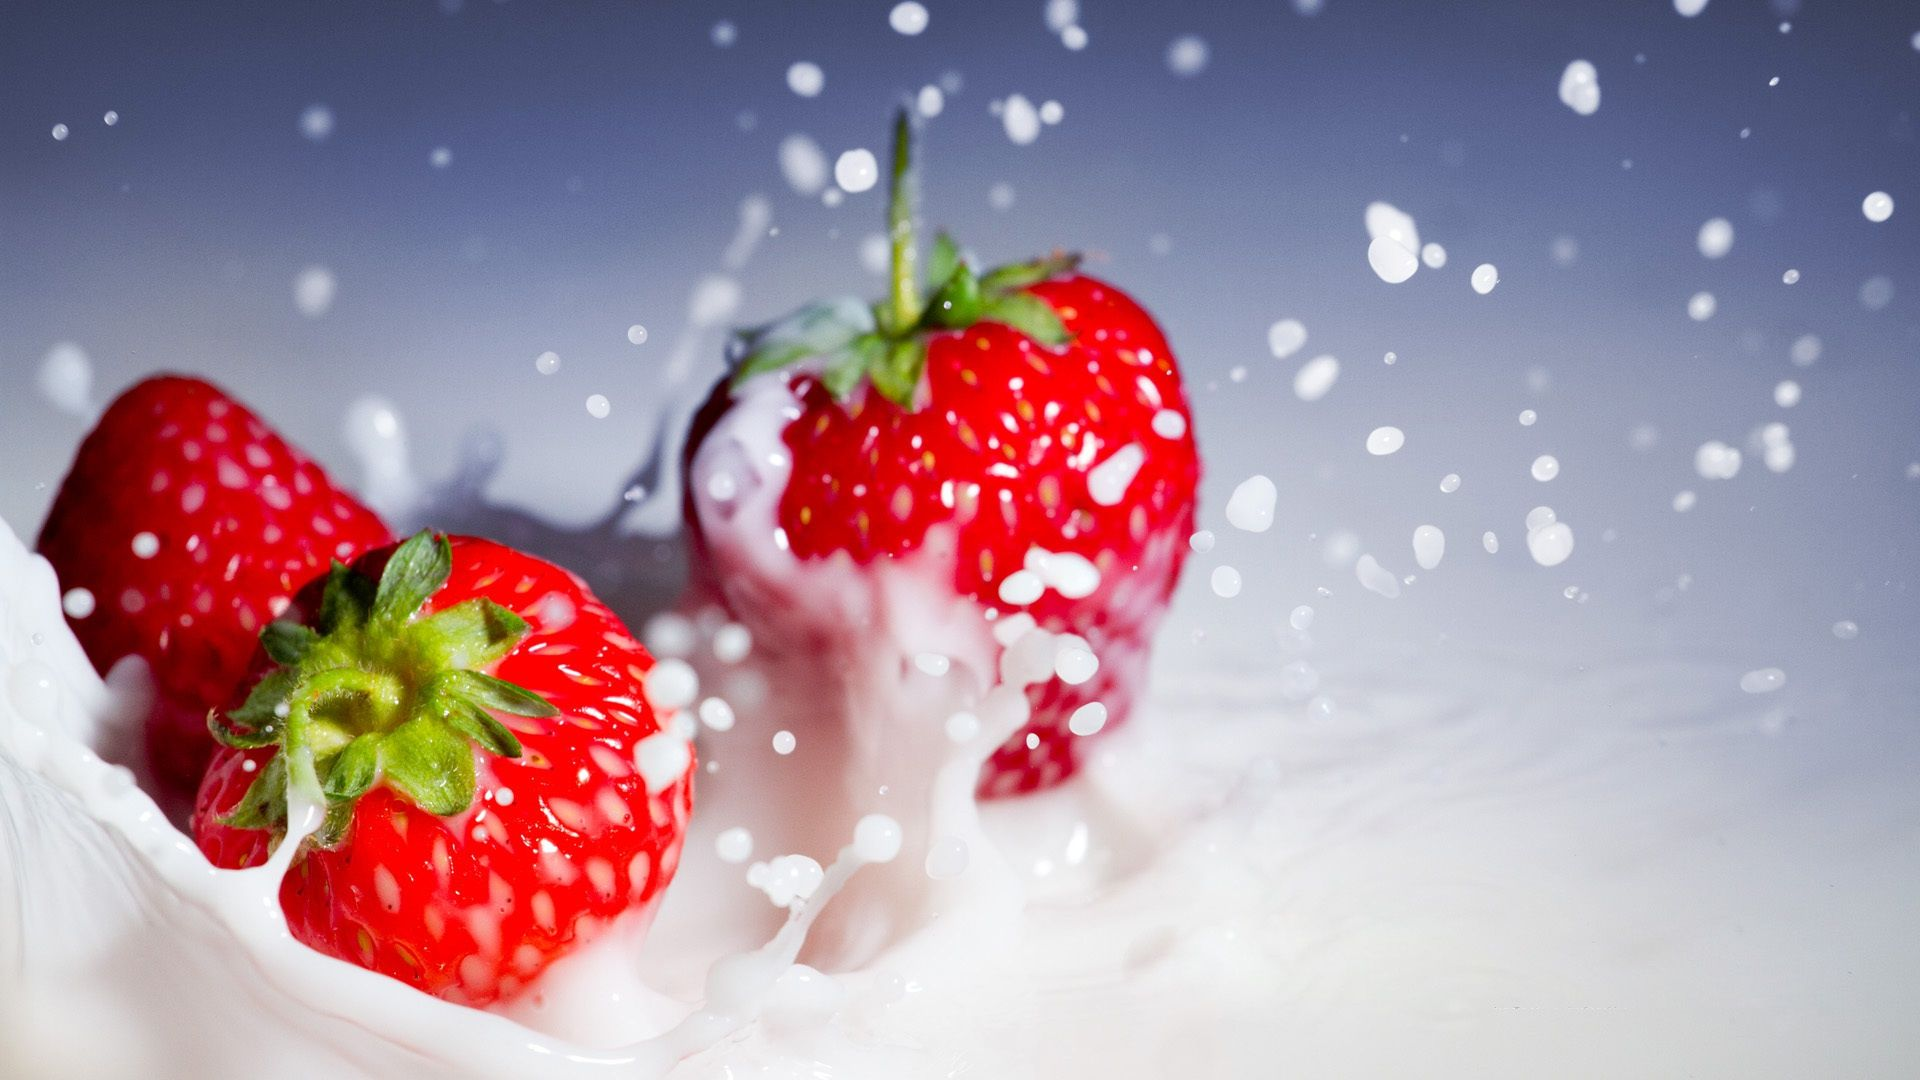 Free Download Beautiful Strawberry Hd Wallpaper Strawberry